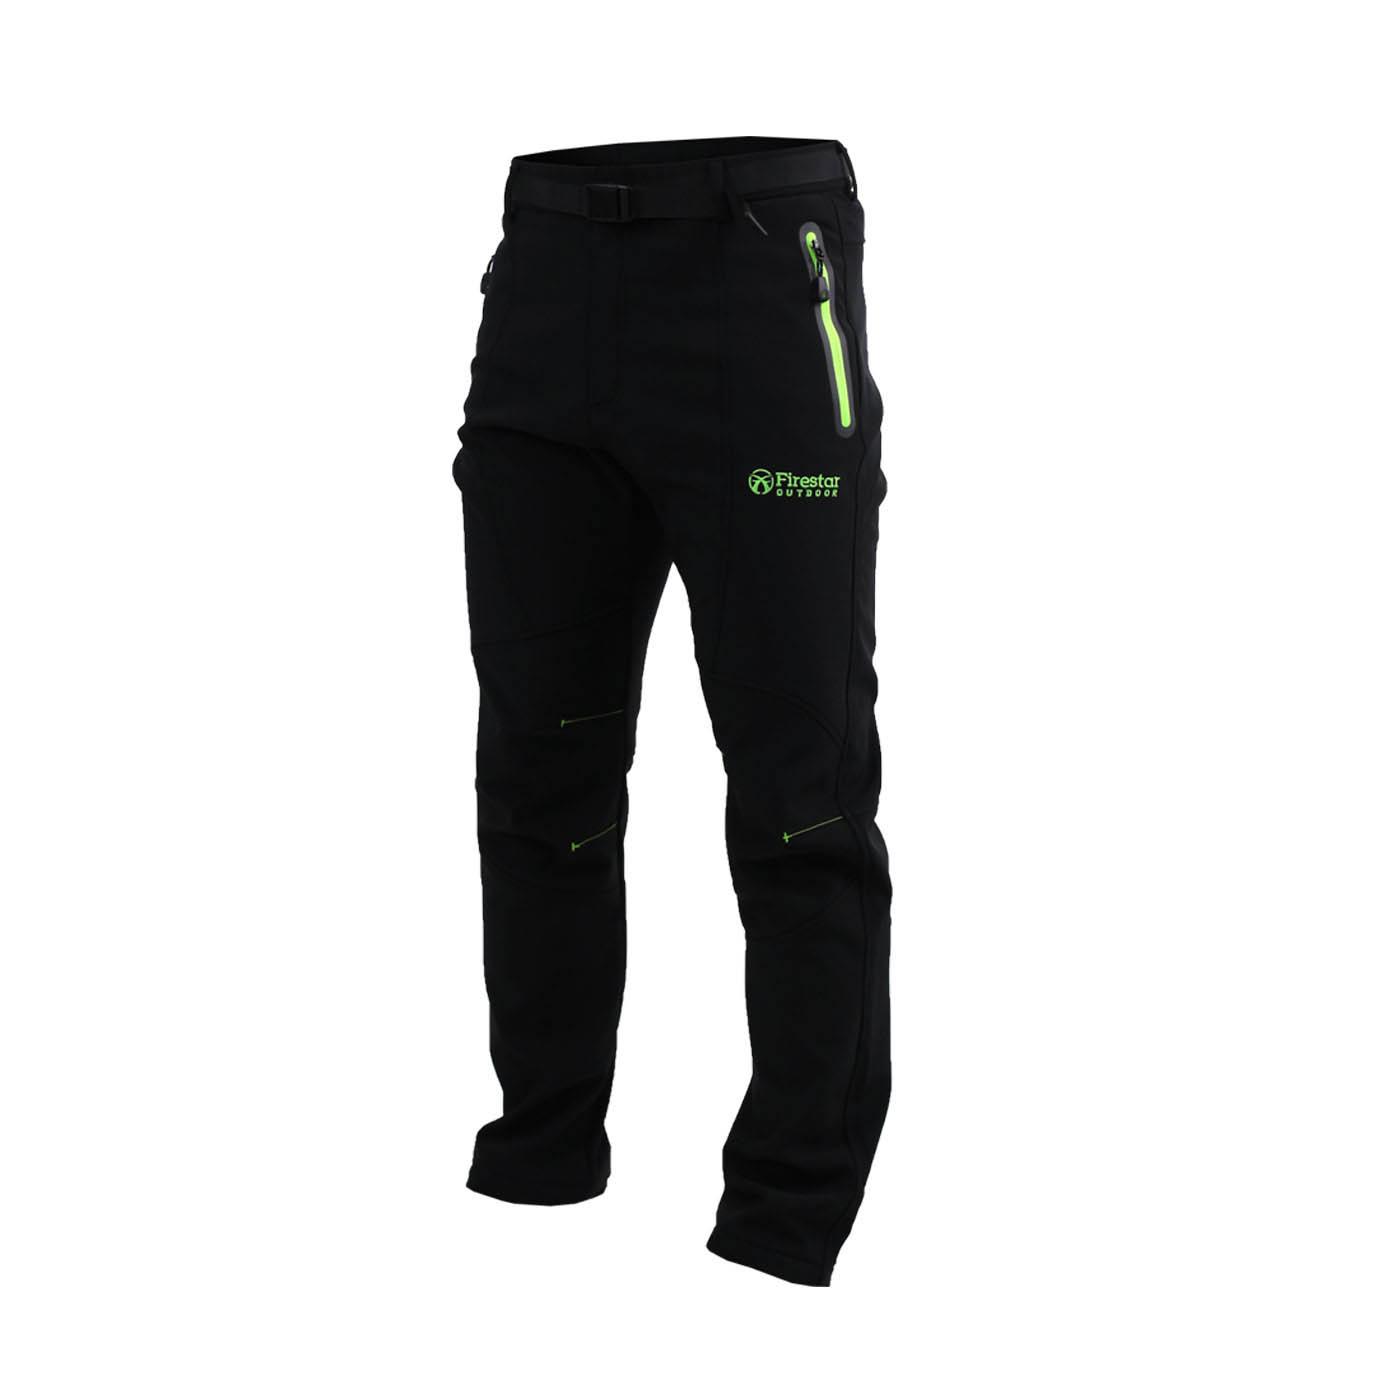 FIRESTAR 男款彈性平織磨毛裏長褲 P6573-40 - 黑螢光綠